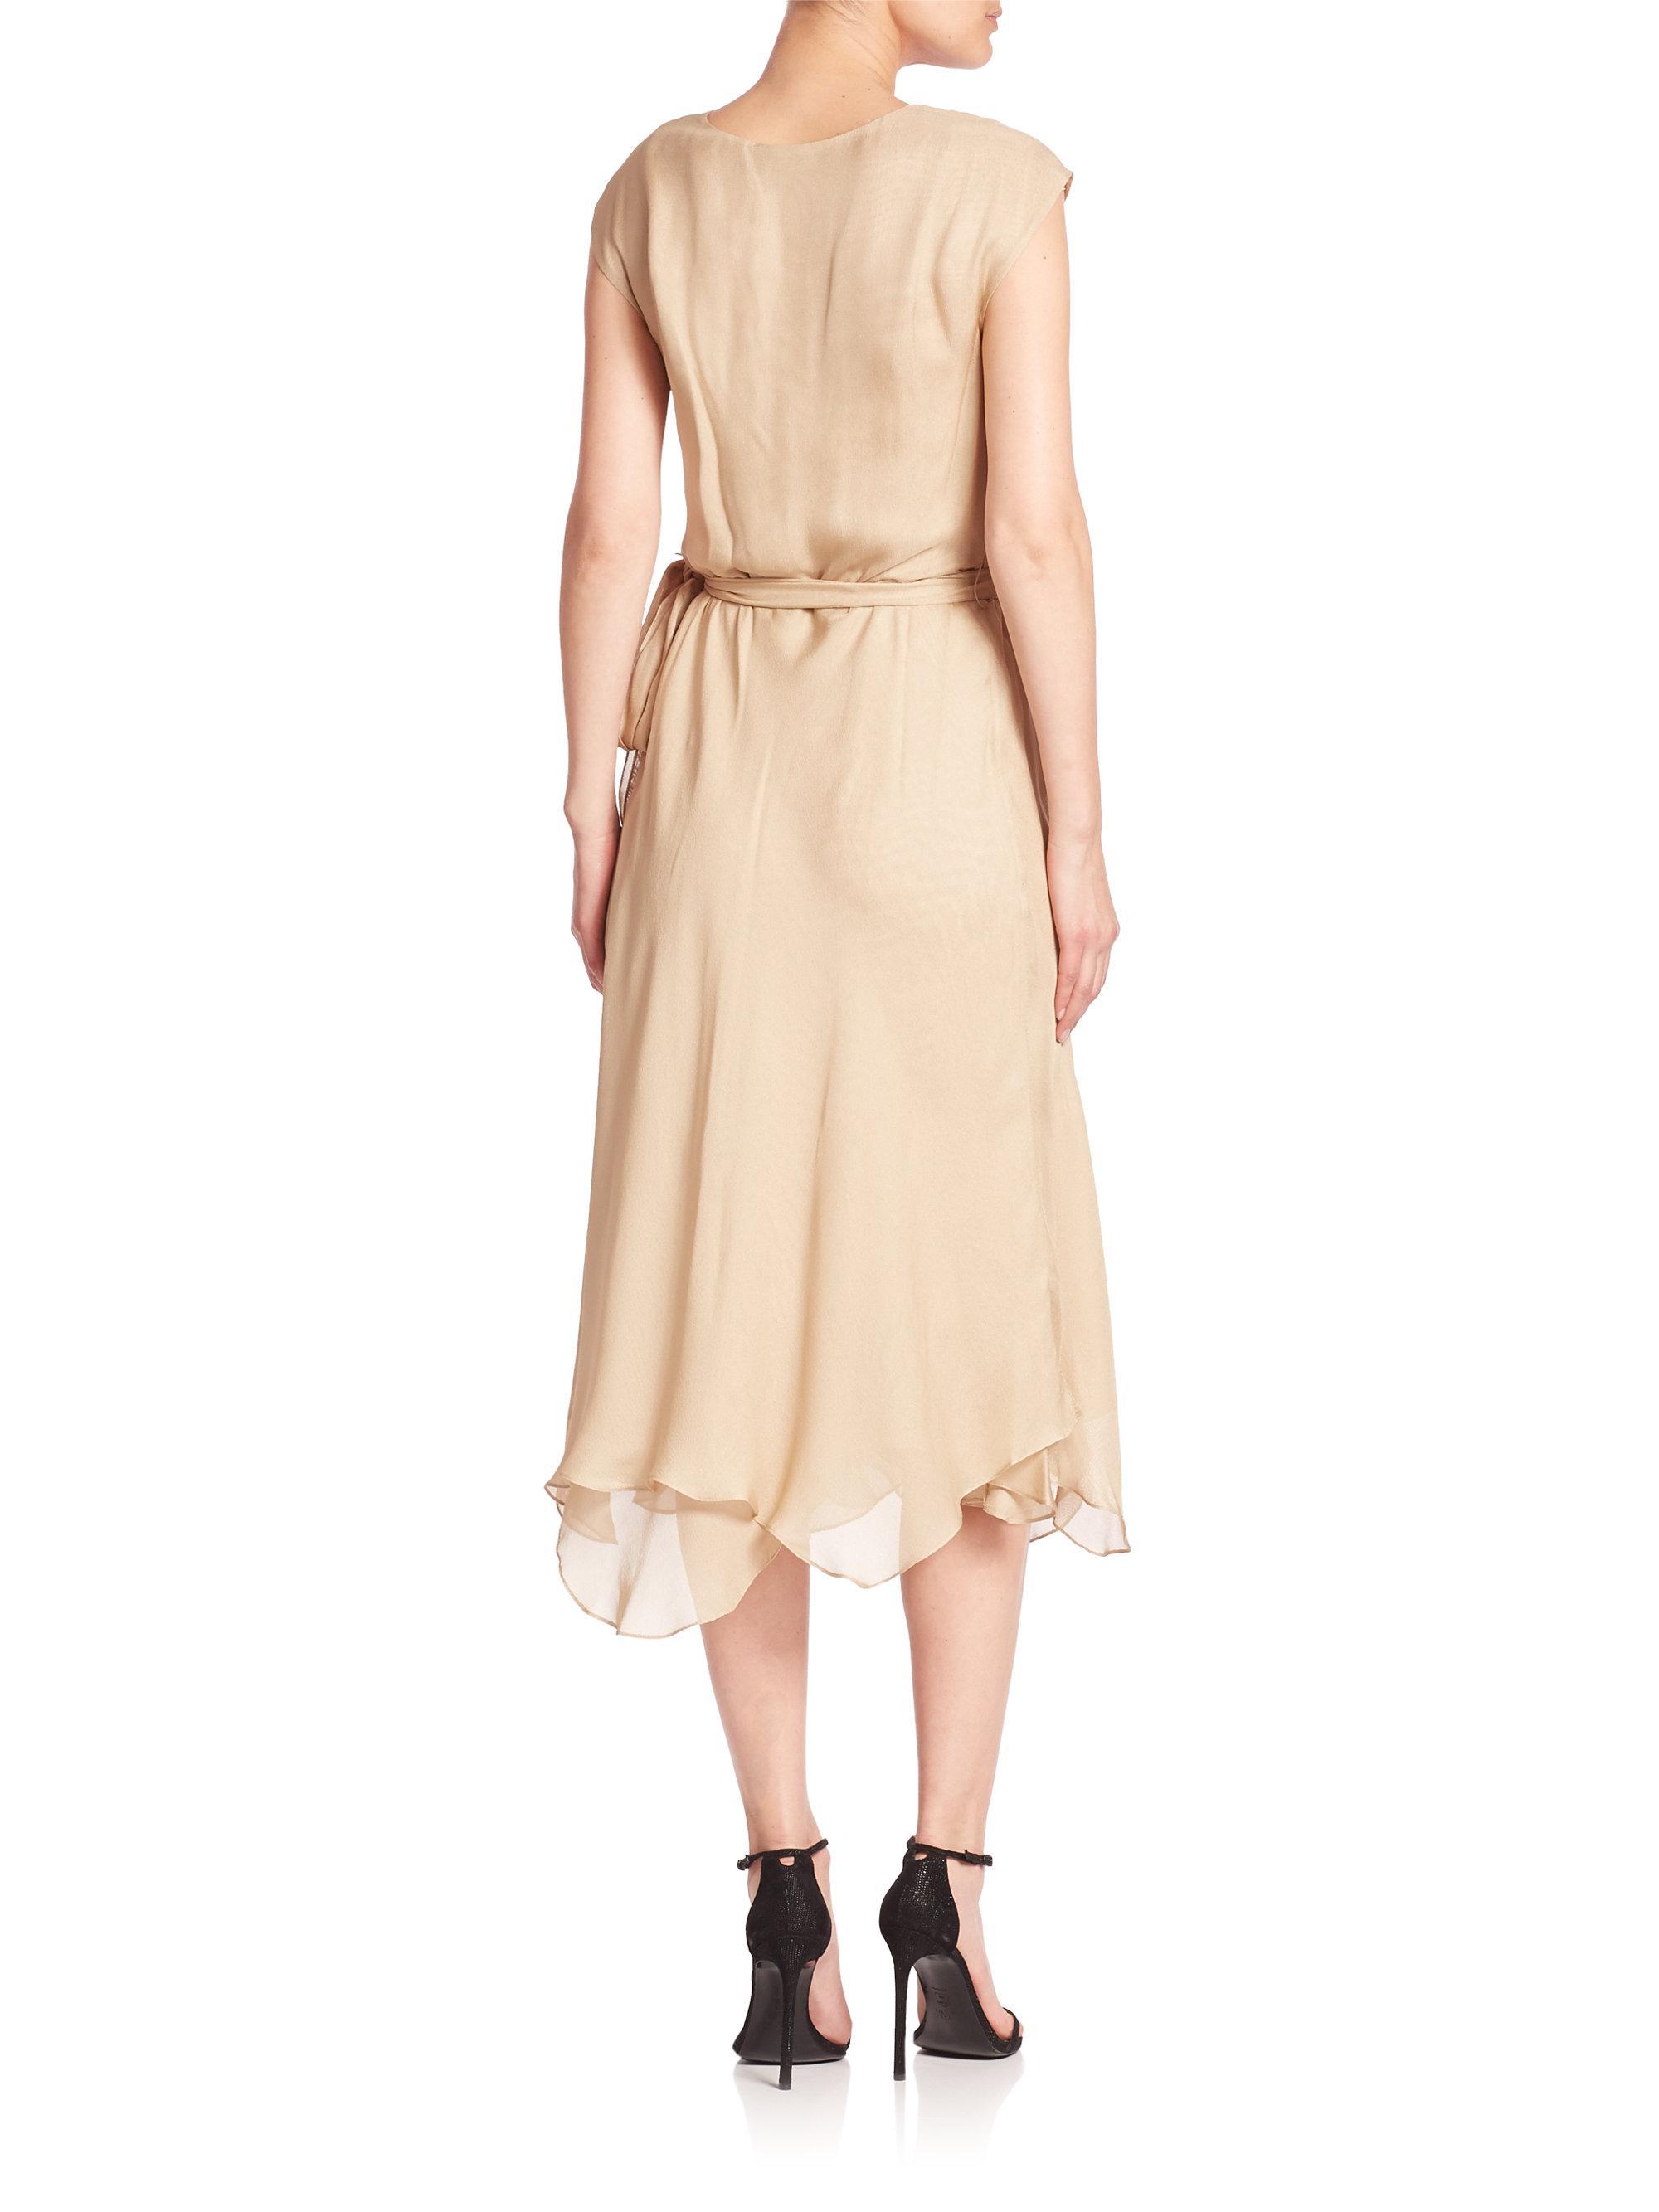 b542ad08582b Polo Ralph Lauren Silk Gauze Wrap Dress in Natural - Lyst